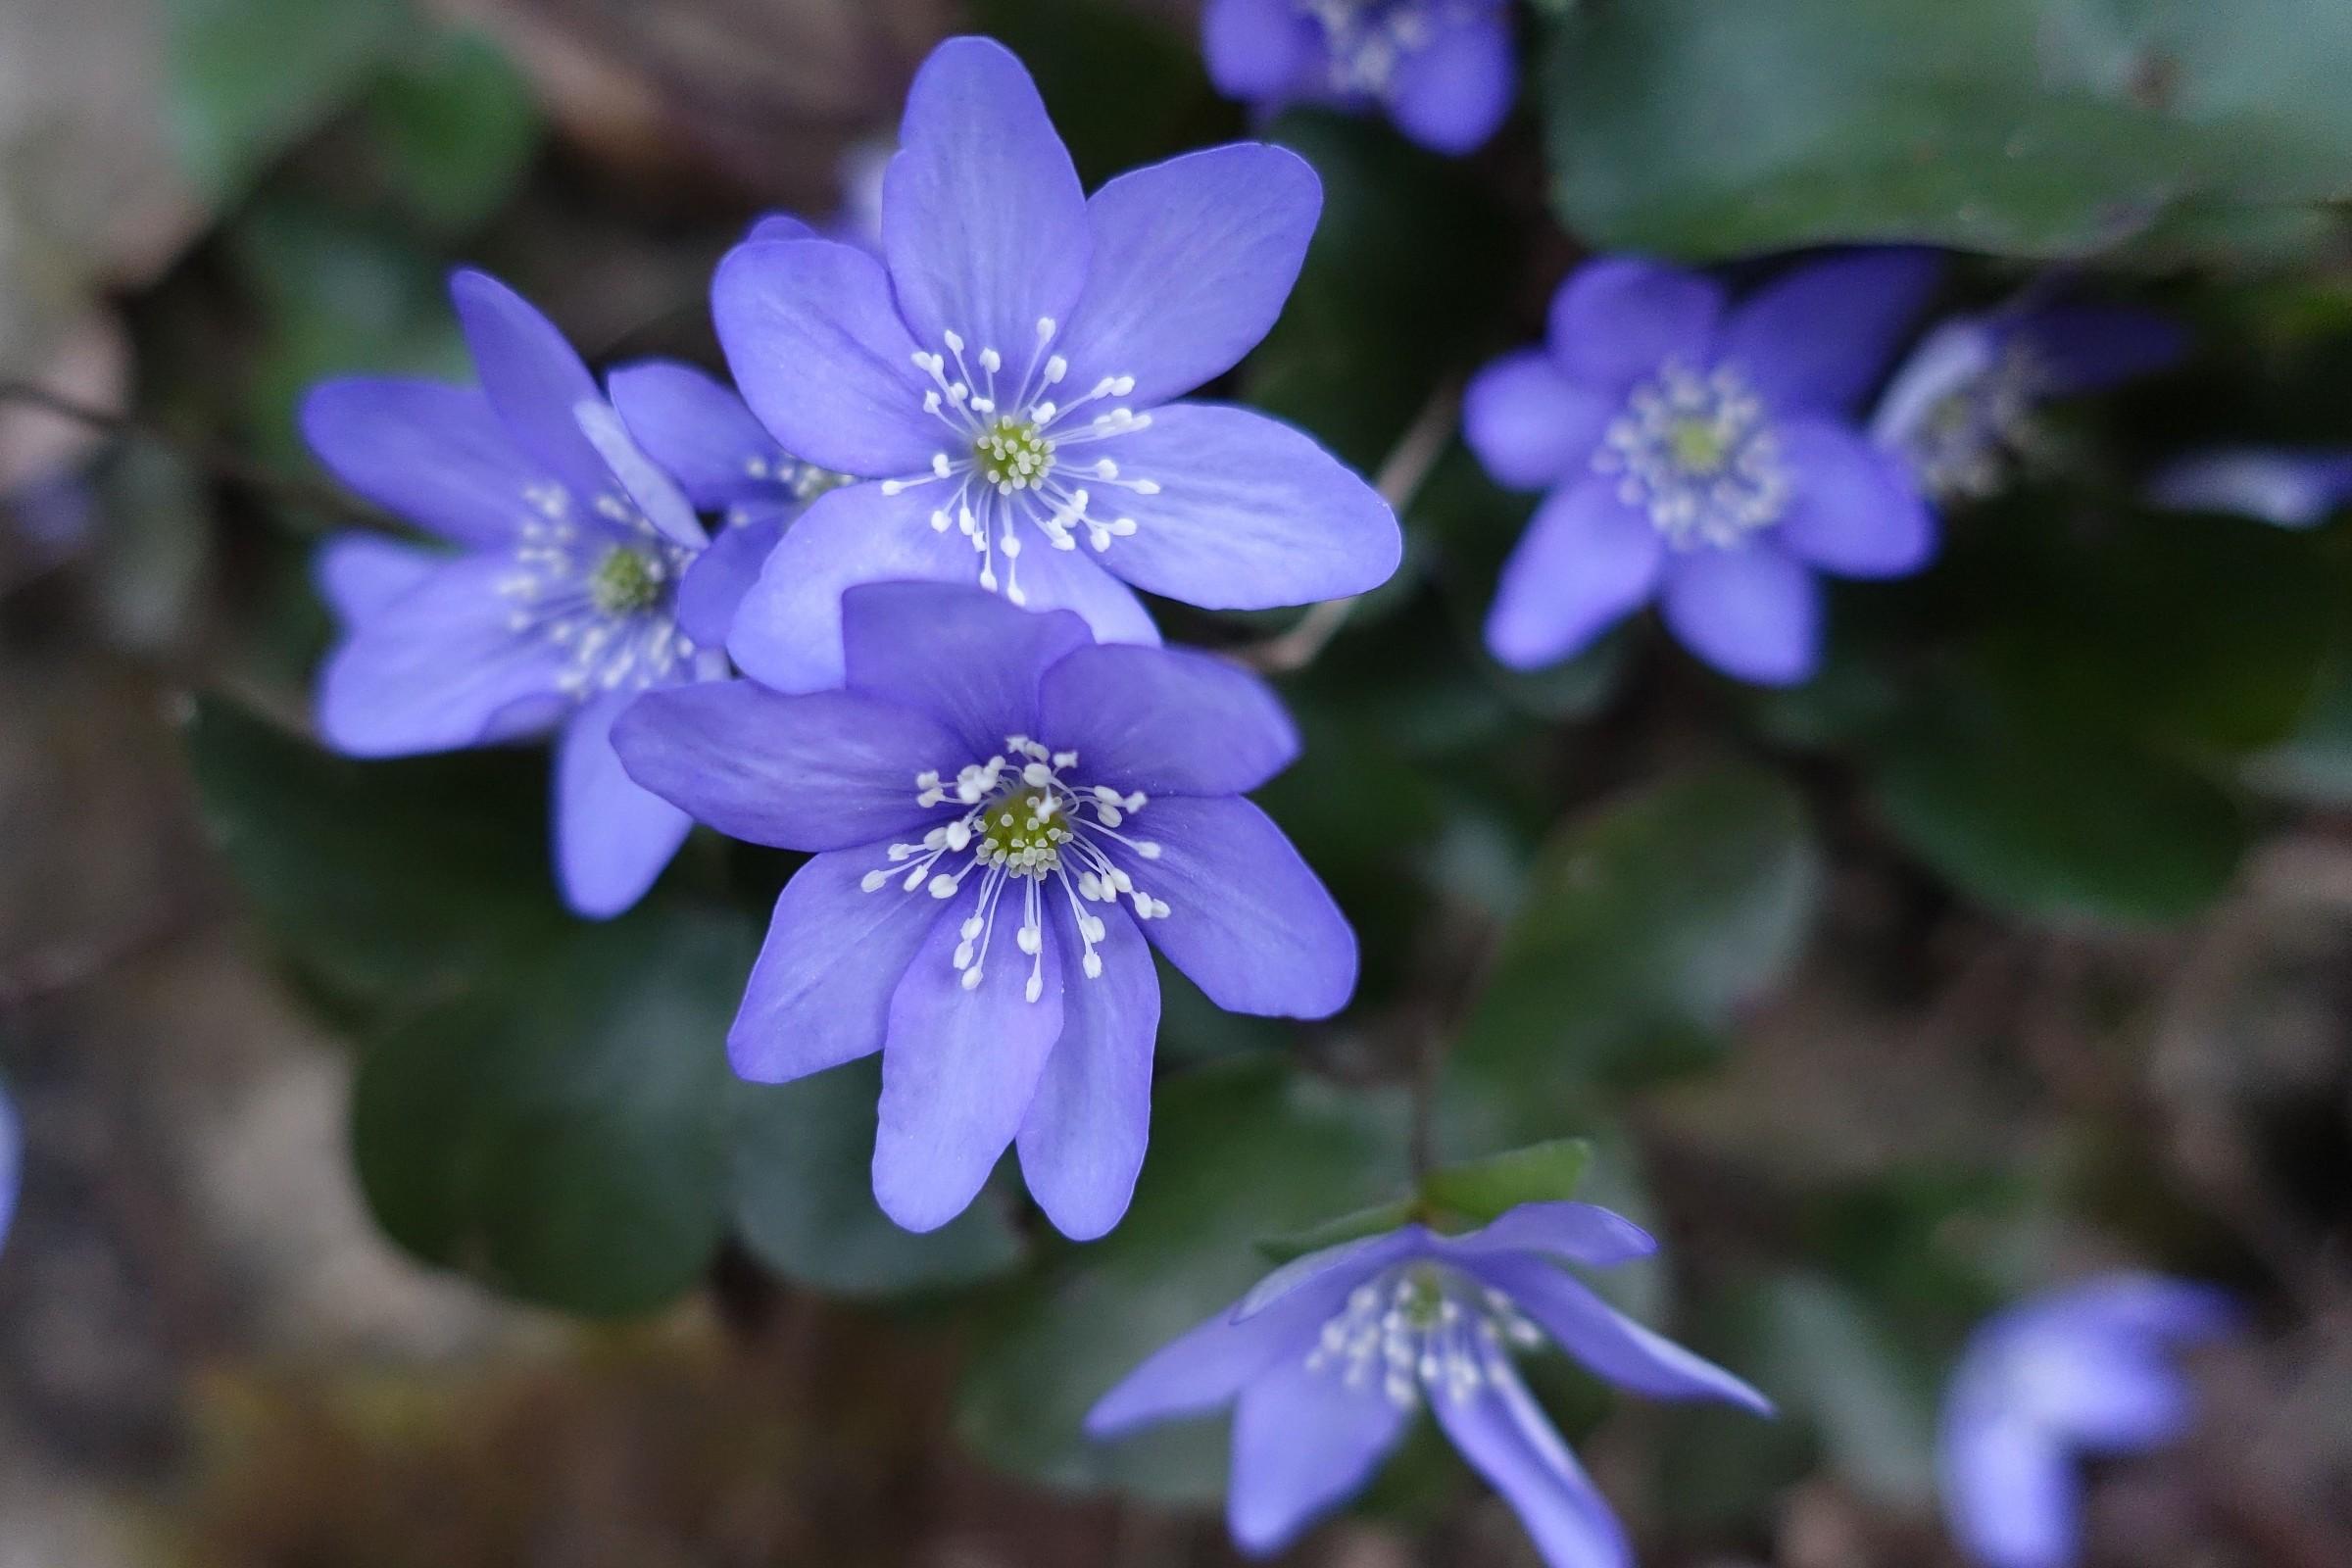 fiori di anemone epatica...